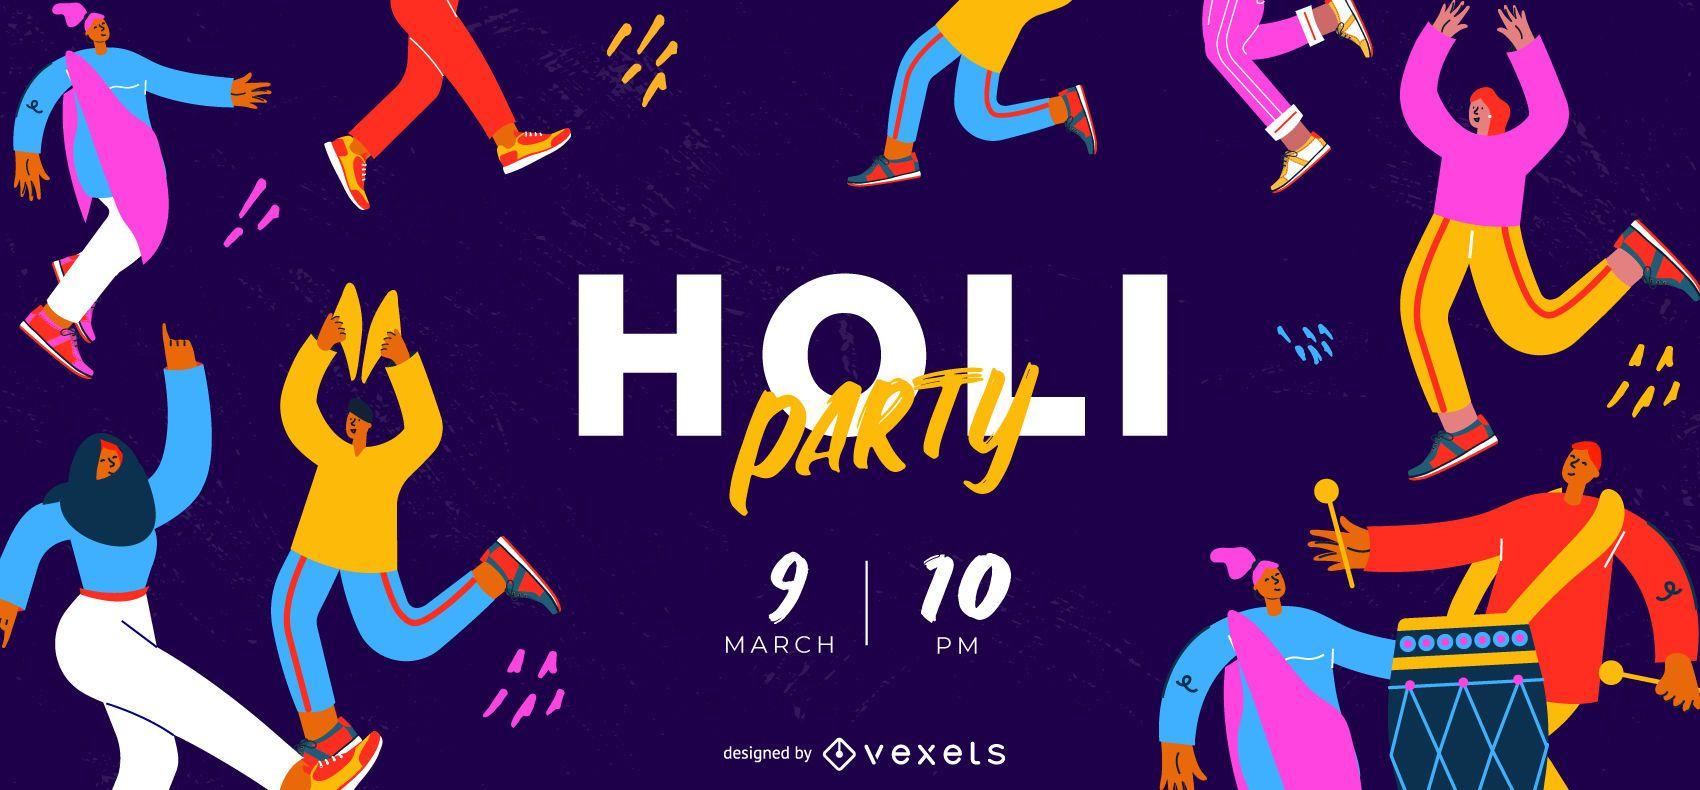 Holi Festival Party Web Slider Design